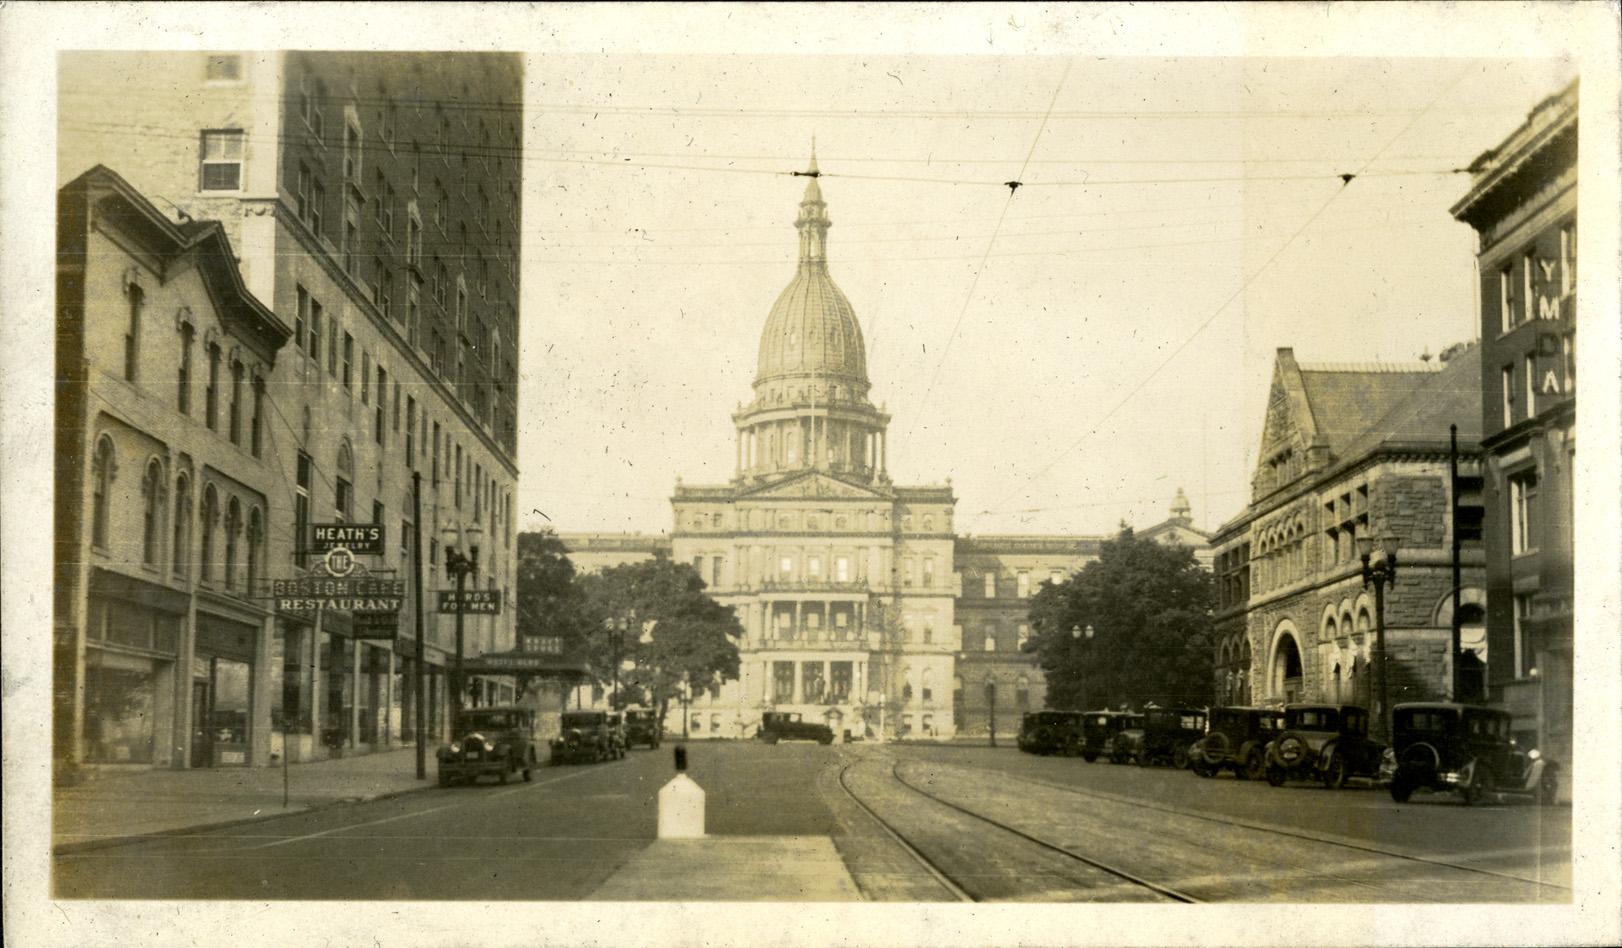 Lansing capitol building, circa 1925